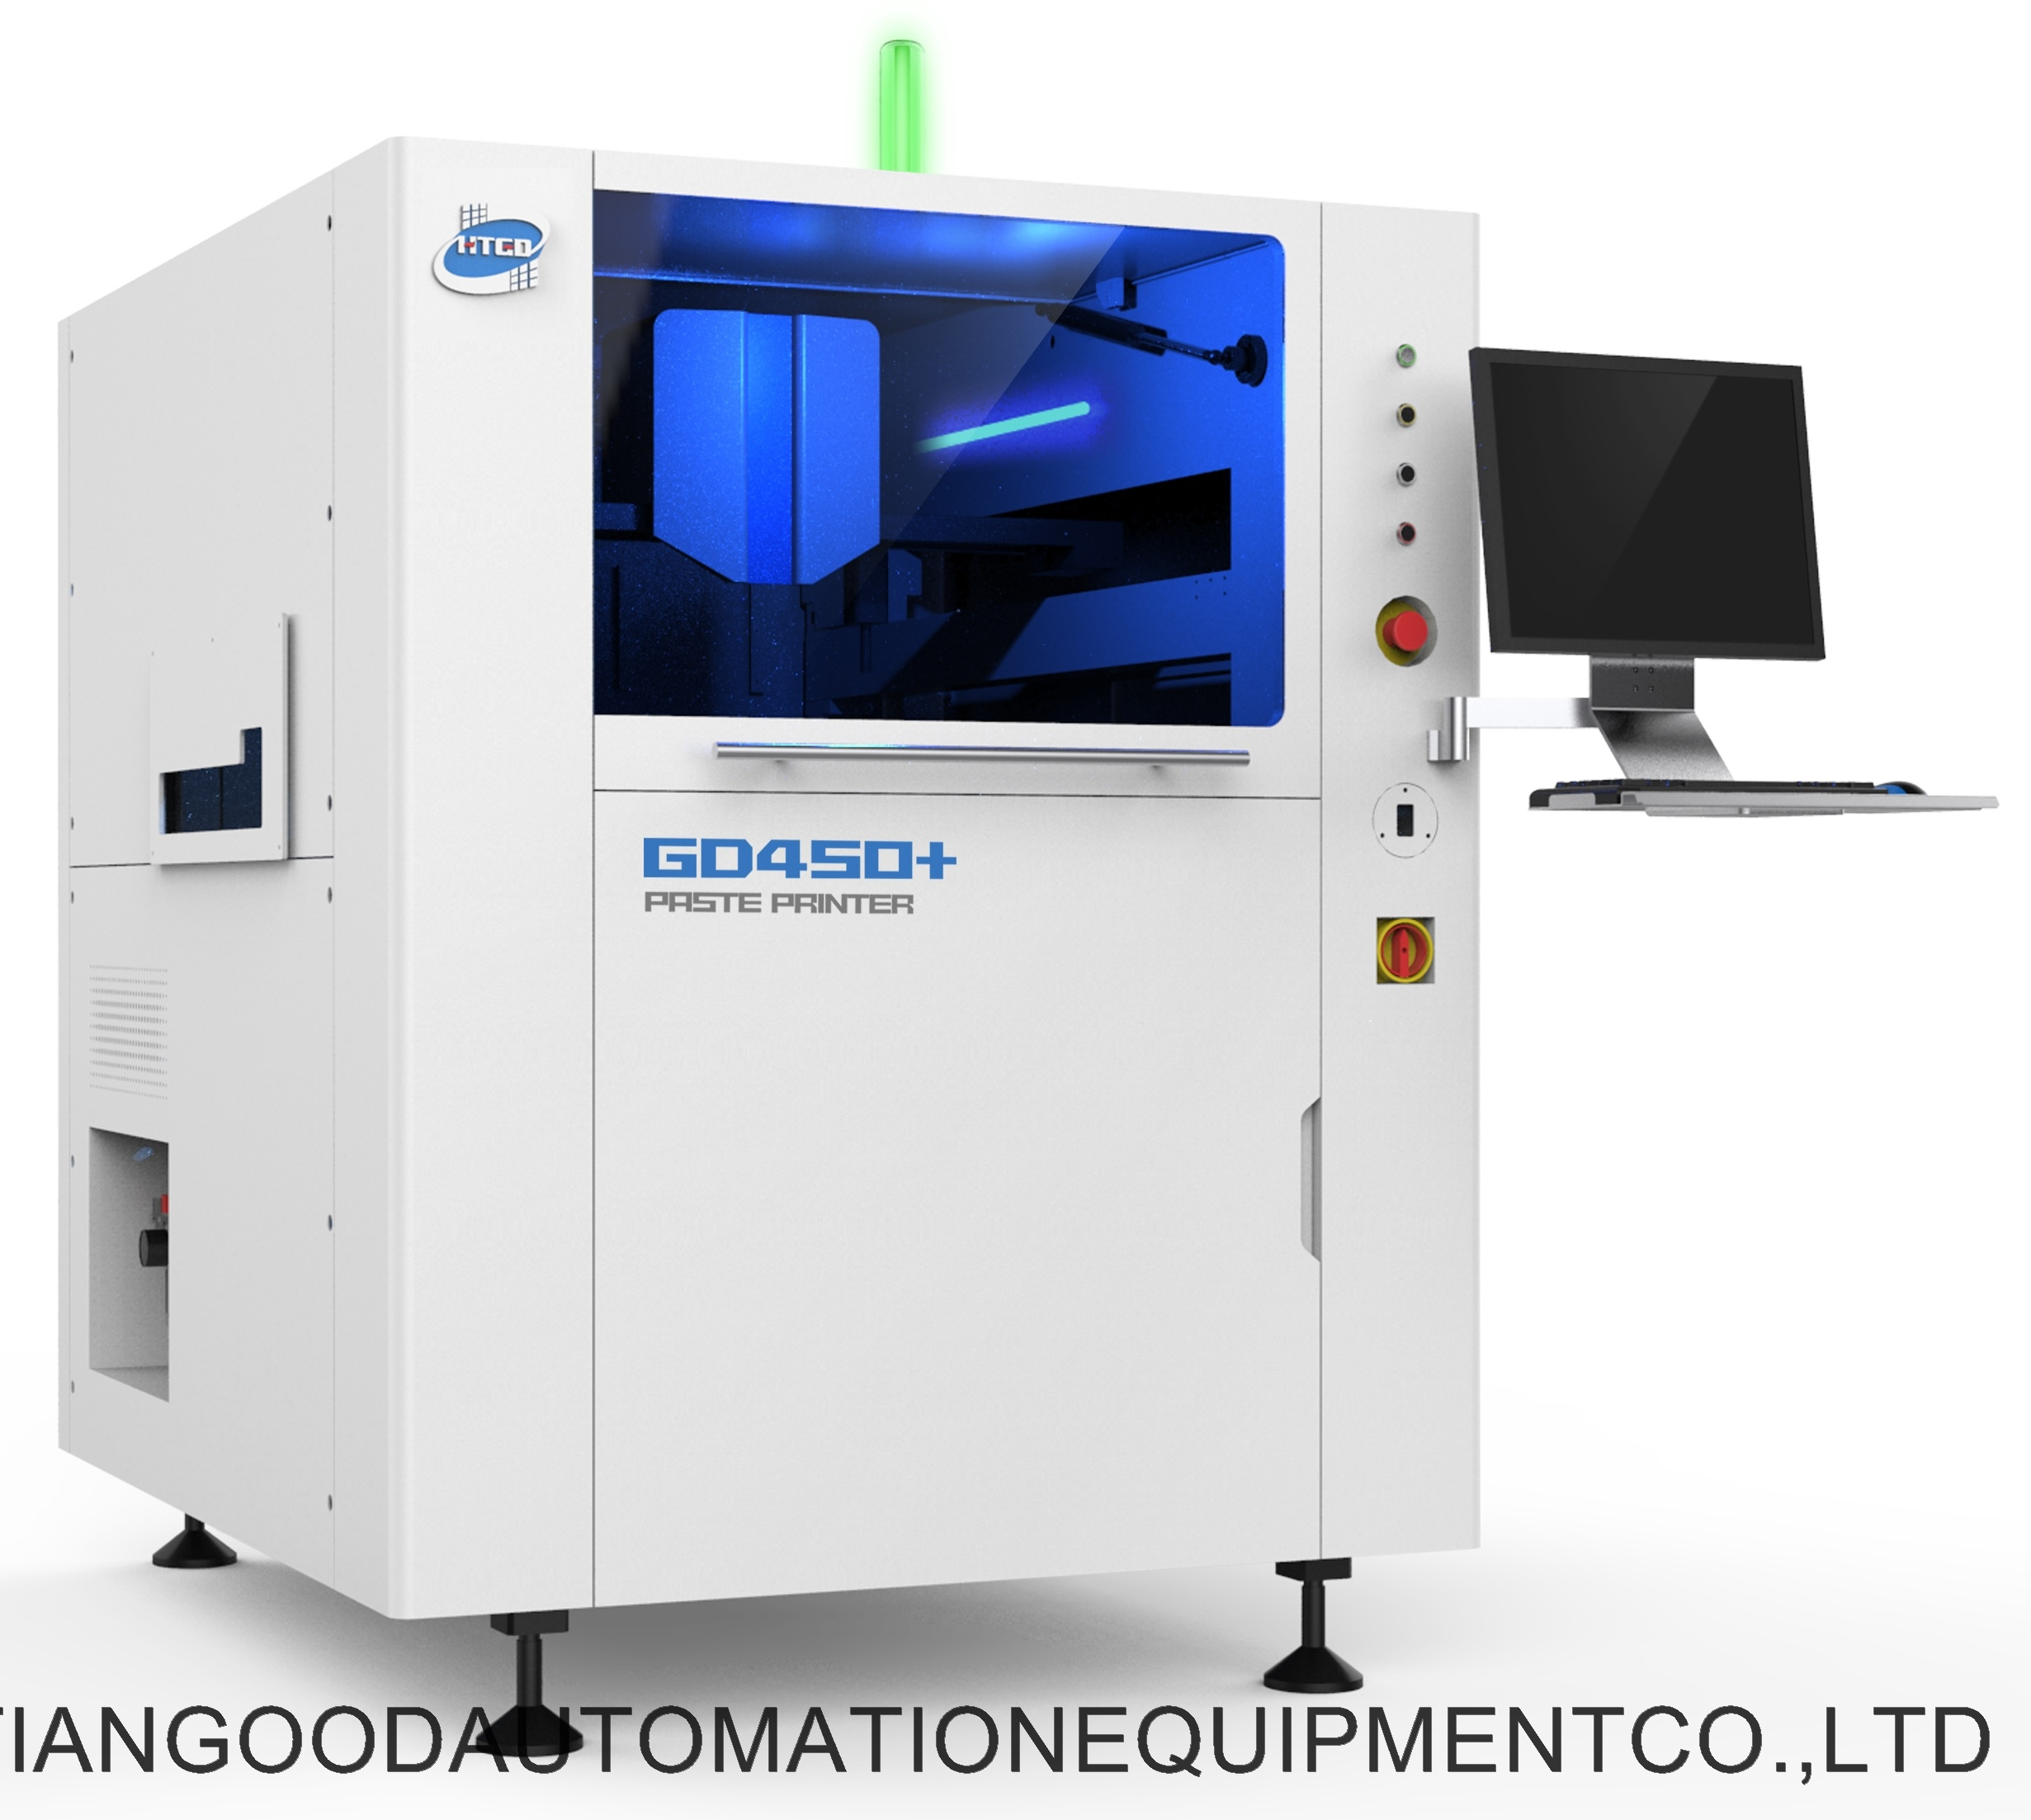 Solder paste printing press